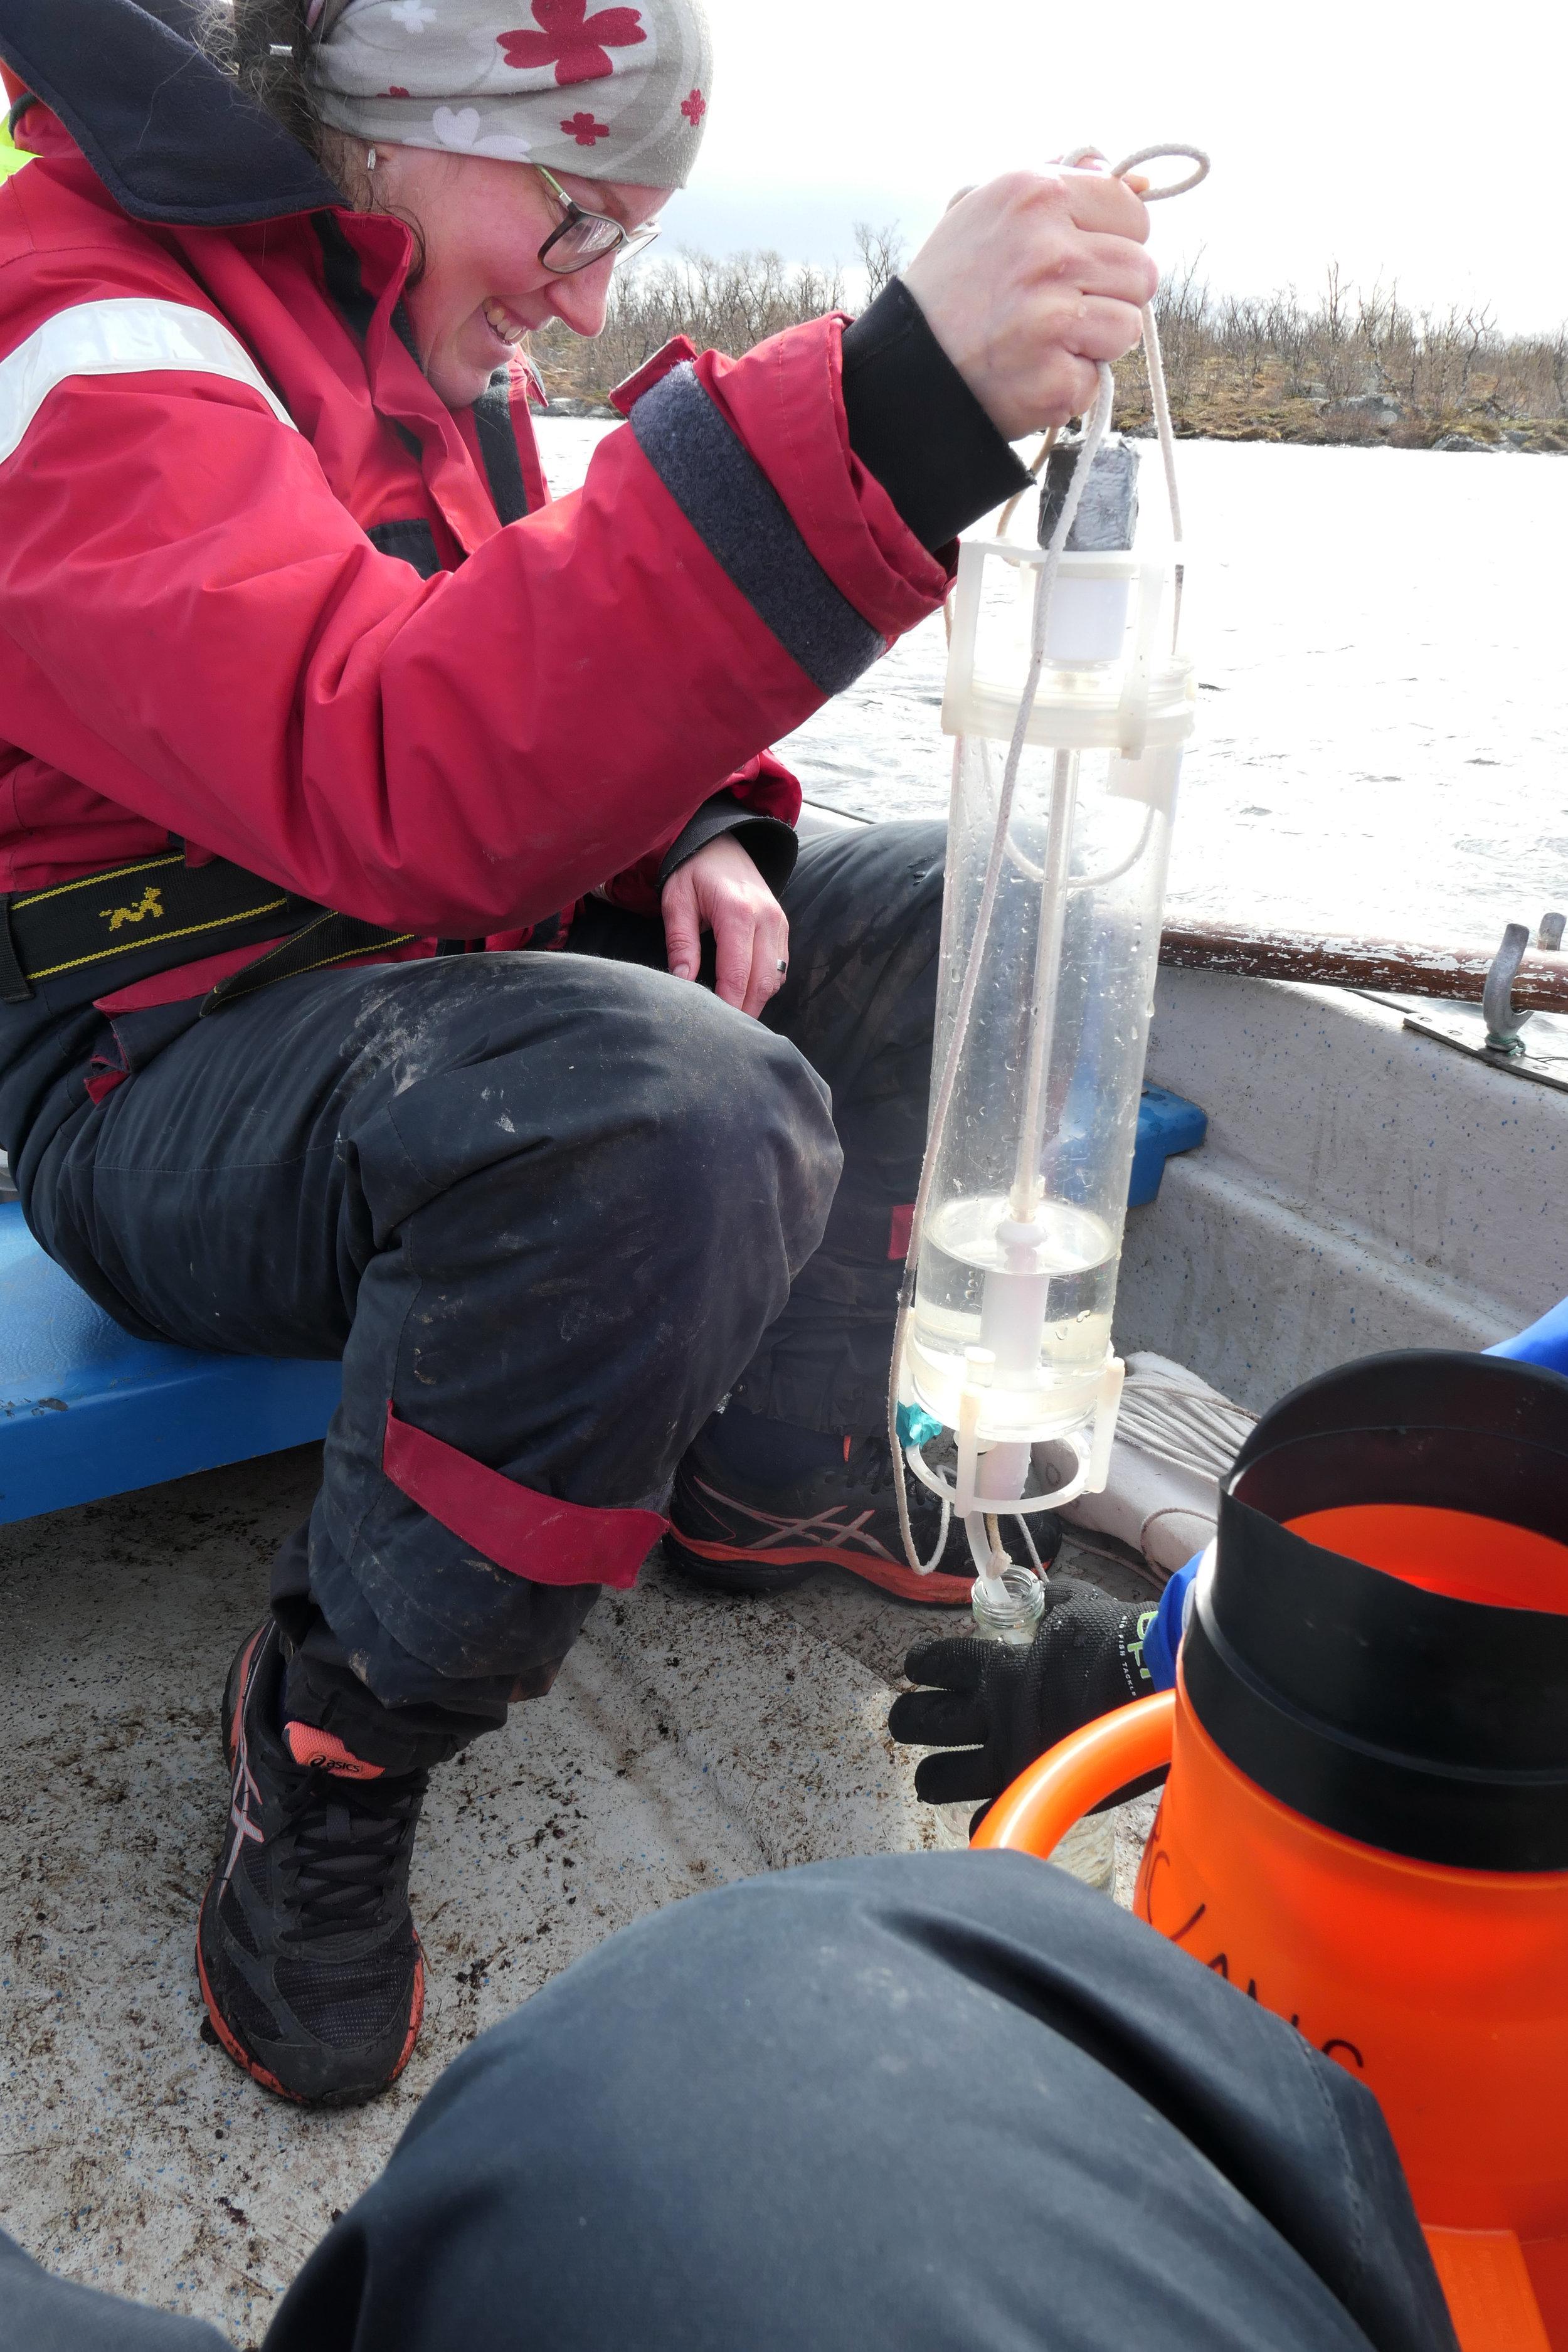 Jenny Ask Watersampling Lake Almberga 03June19 Photo by Joelle.jpg